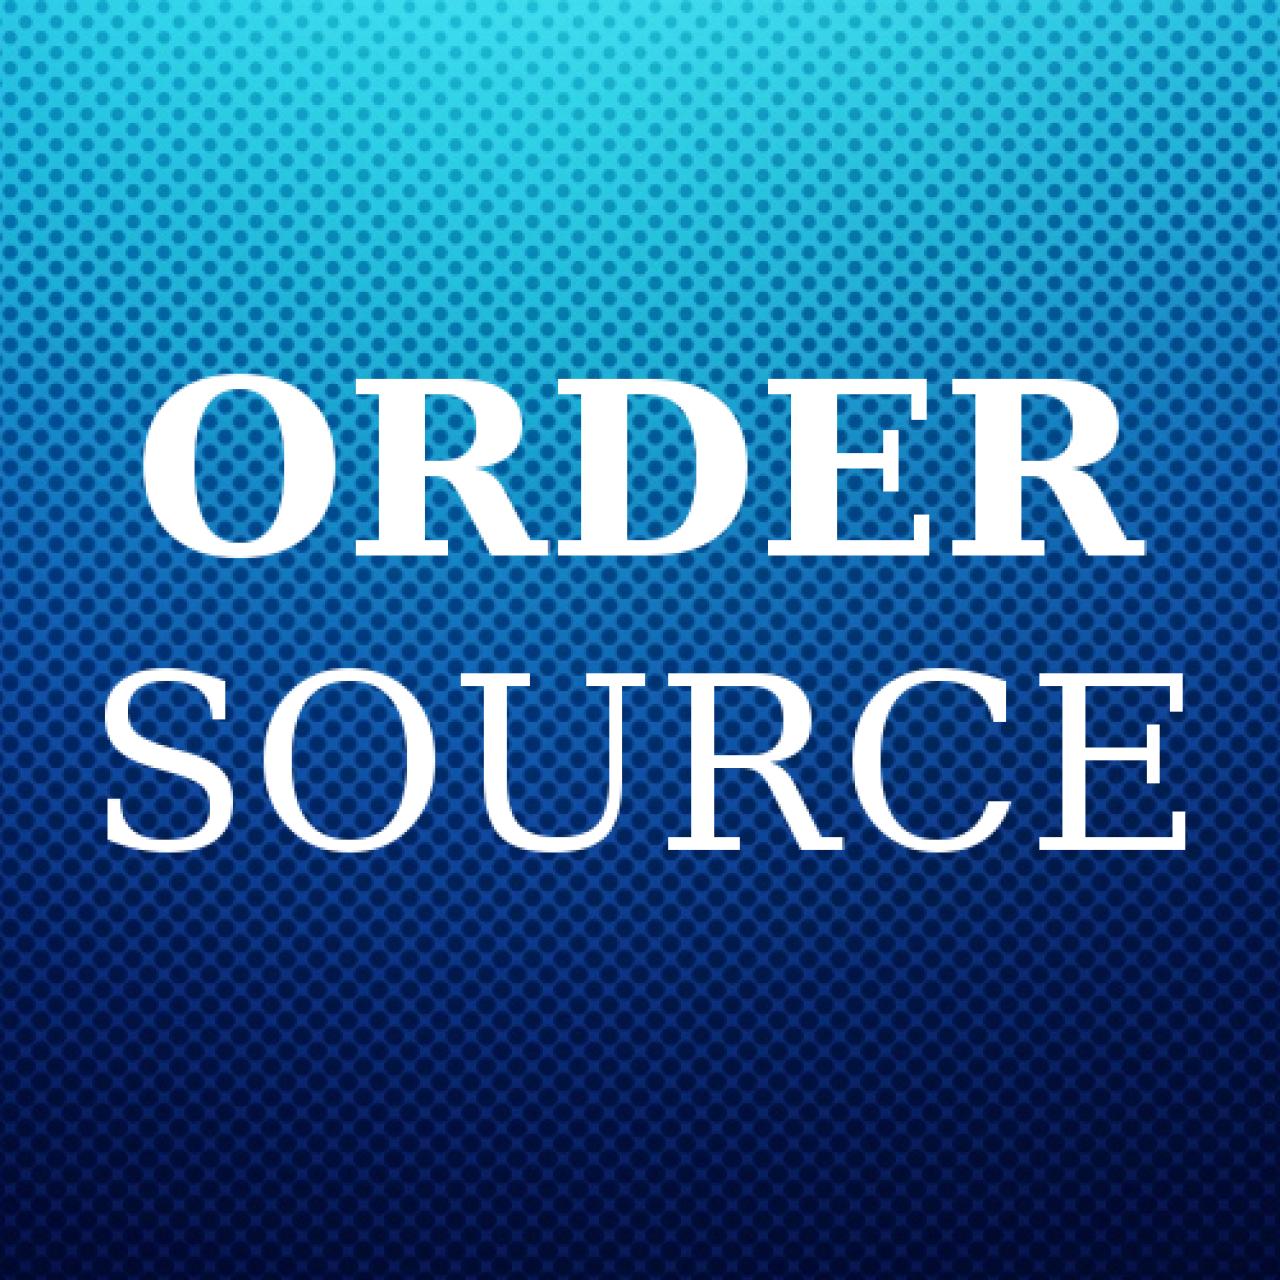 Order Source - модуль источника заказа и отслеживания utm - меток 1.1.0 из категории Заказ, корзина для CMS OpenCart (ОпенКарт)